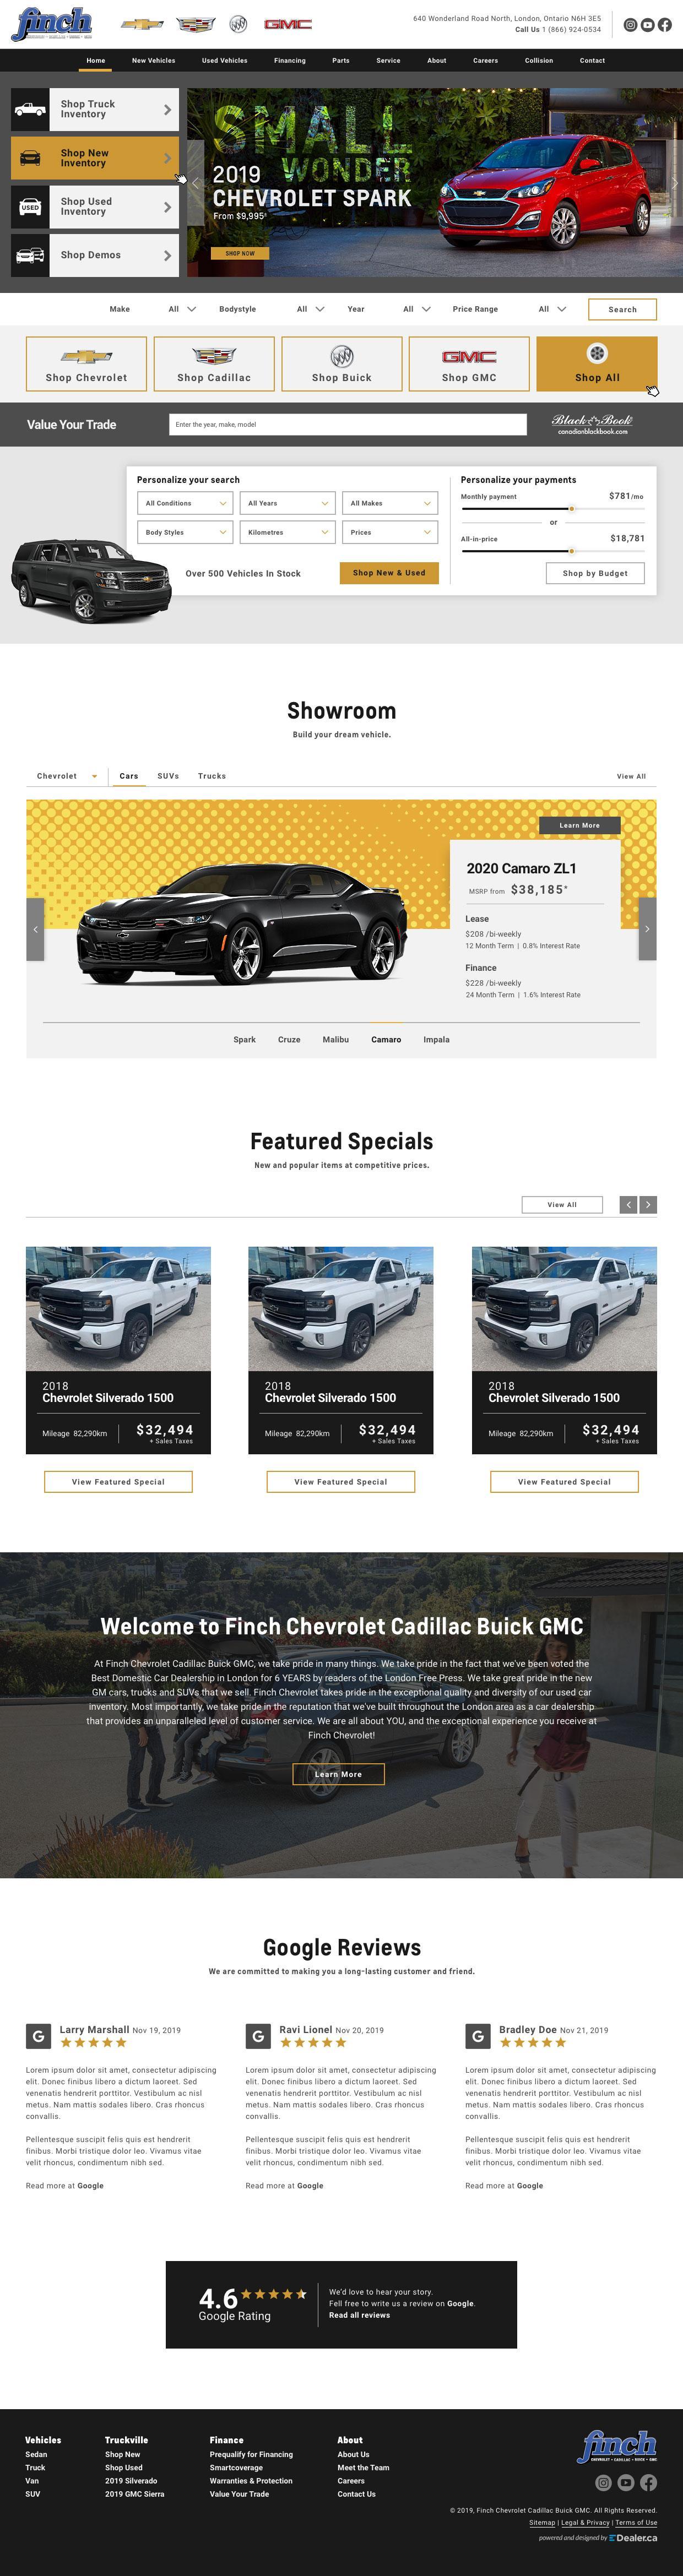 Finch Chevrolet Cadillac Buick GMC